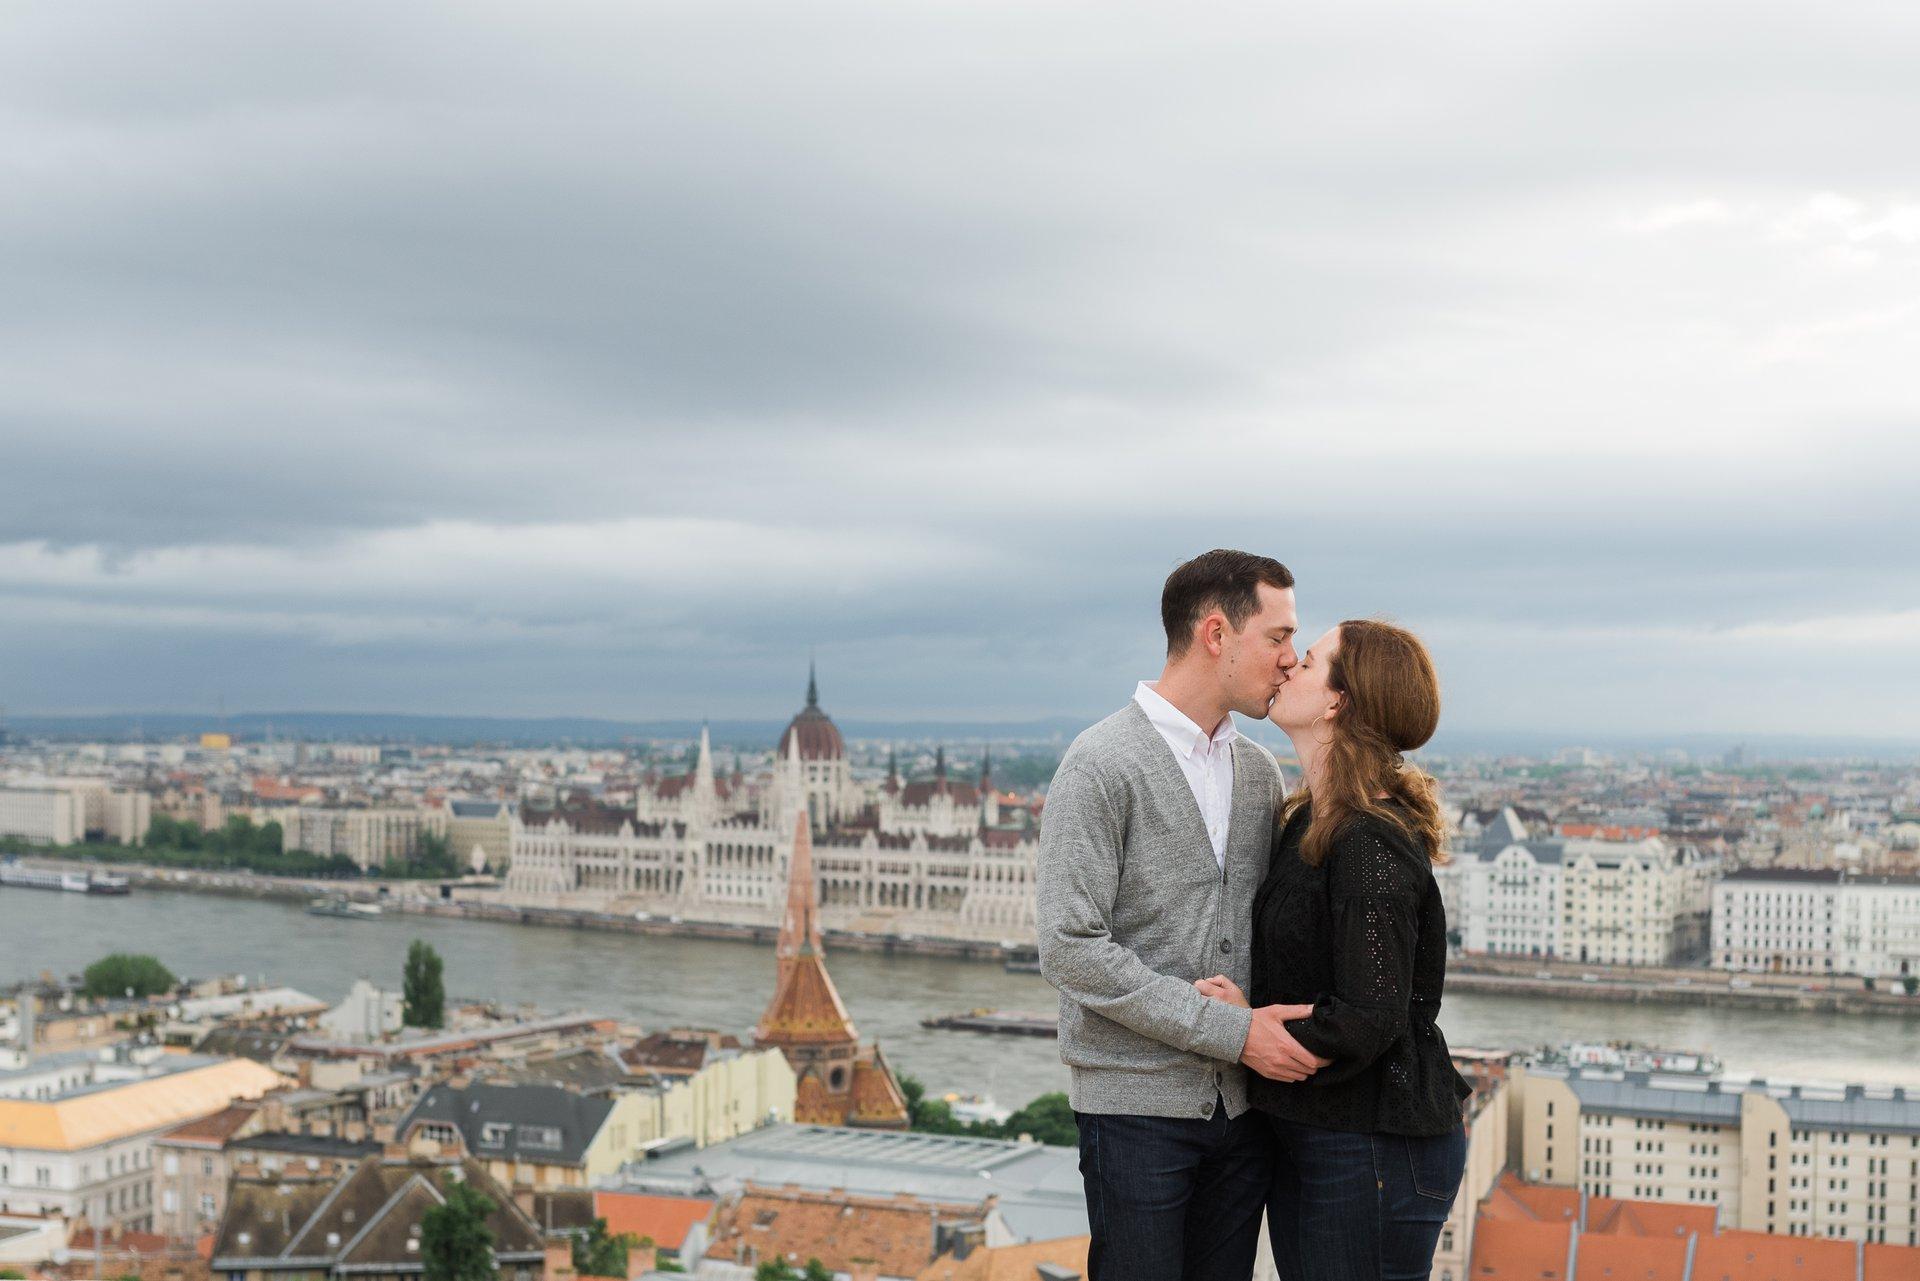 Budapest-Hungary-travel-story-Flytographer-3